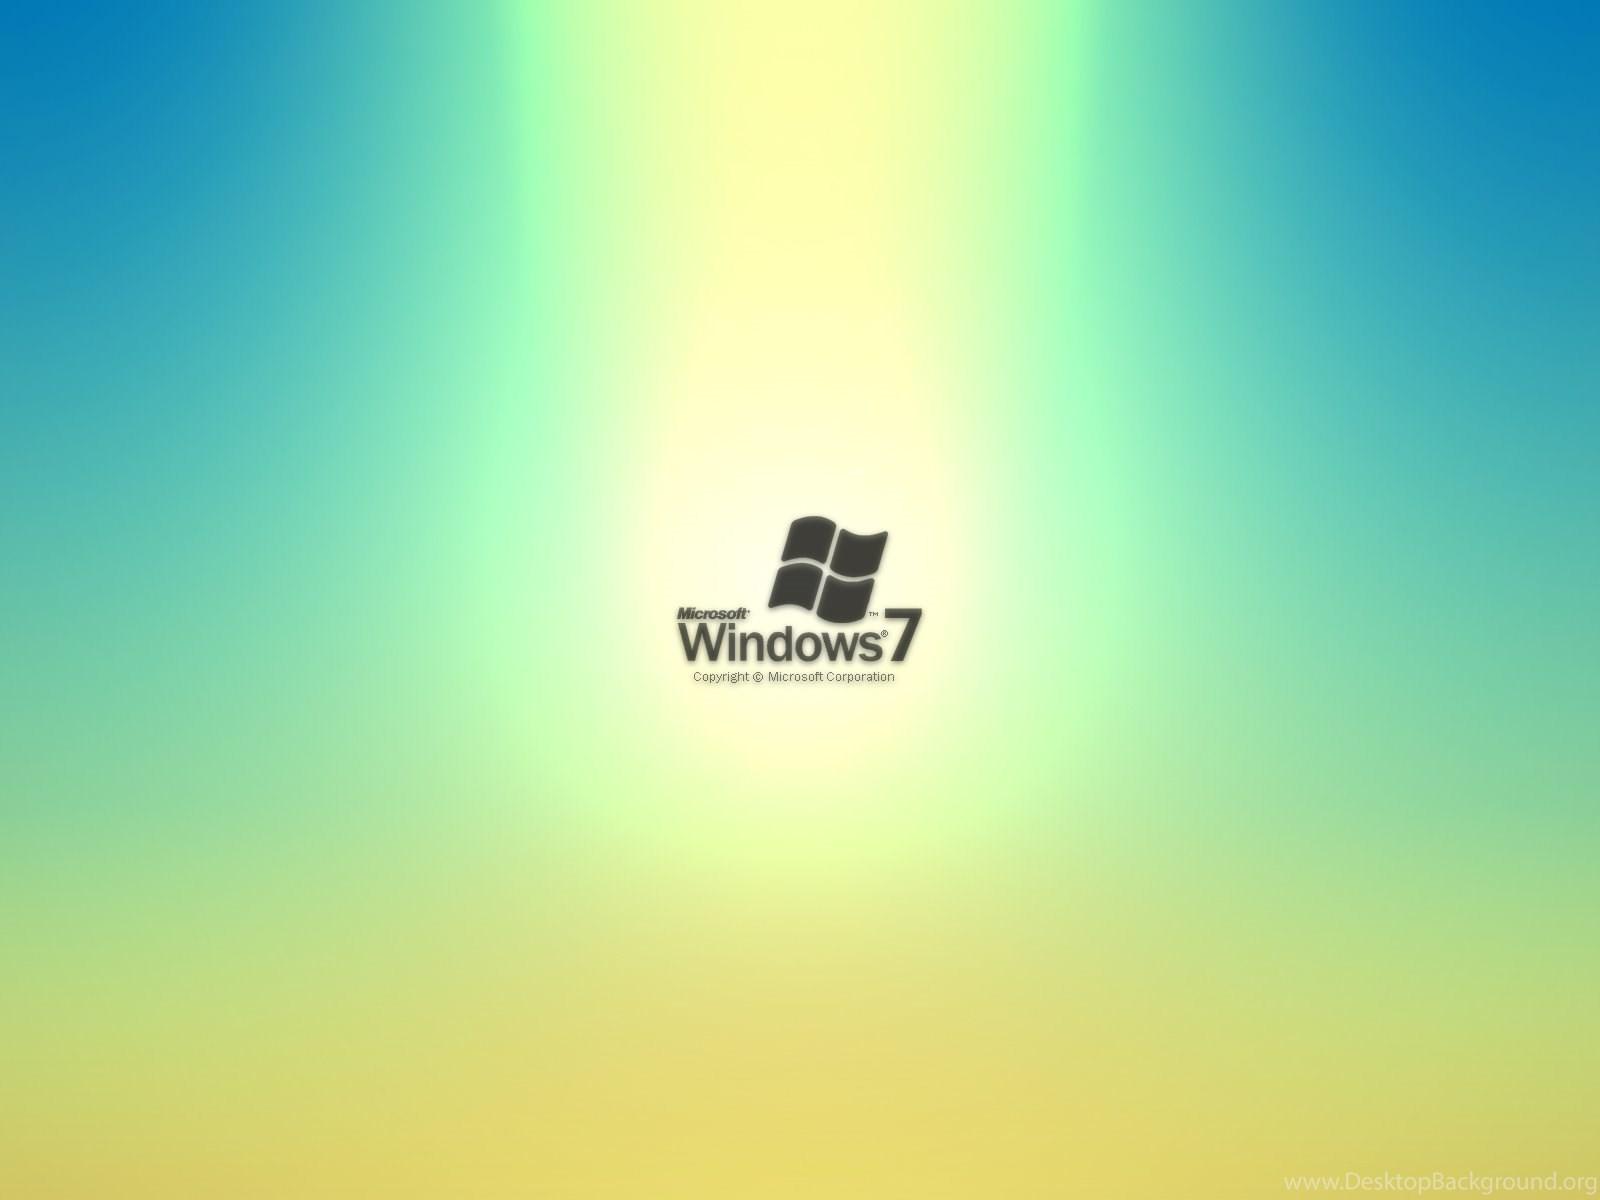 Abstract 3d Free Windows 7 Wallpapers Pack 1045 Desktop